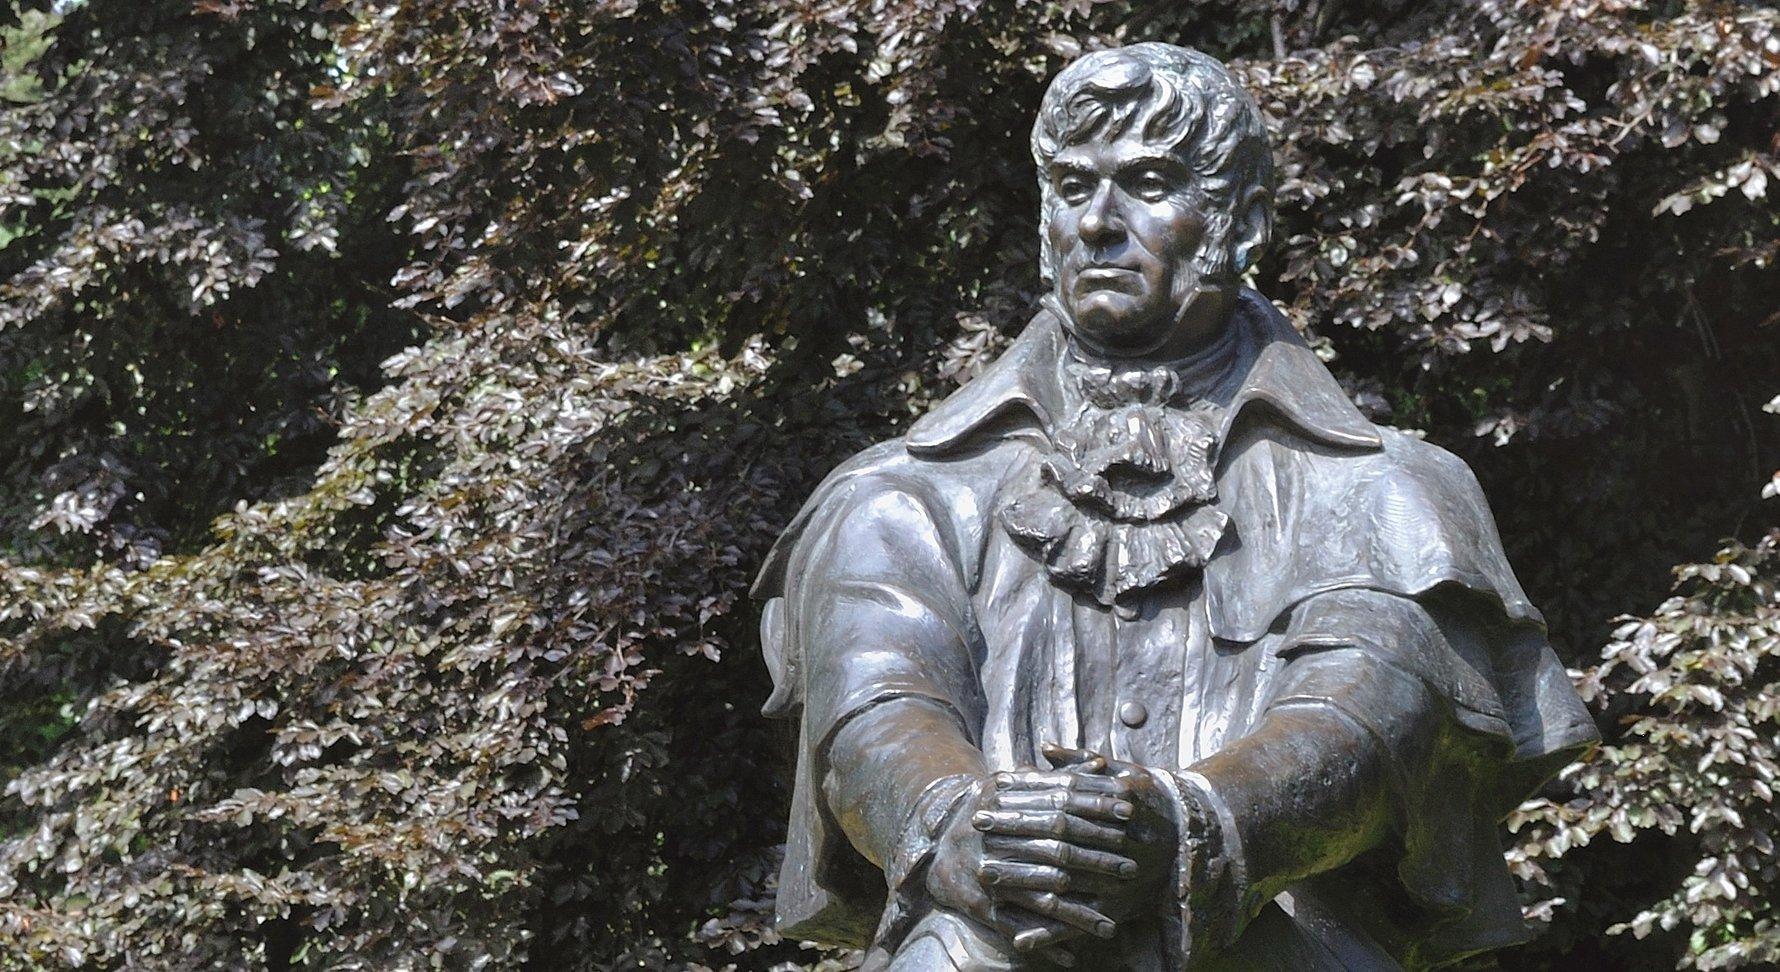 Statue of Jean Georges Haffner. Photo by DerHexer